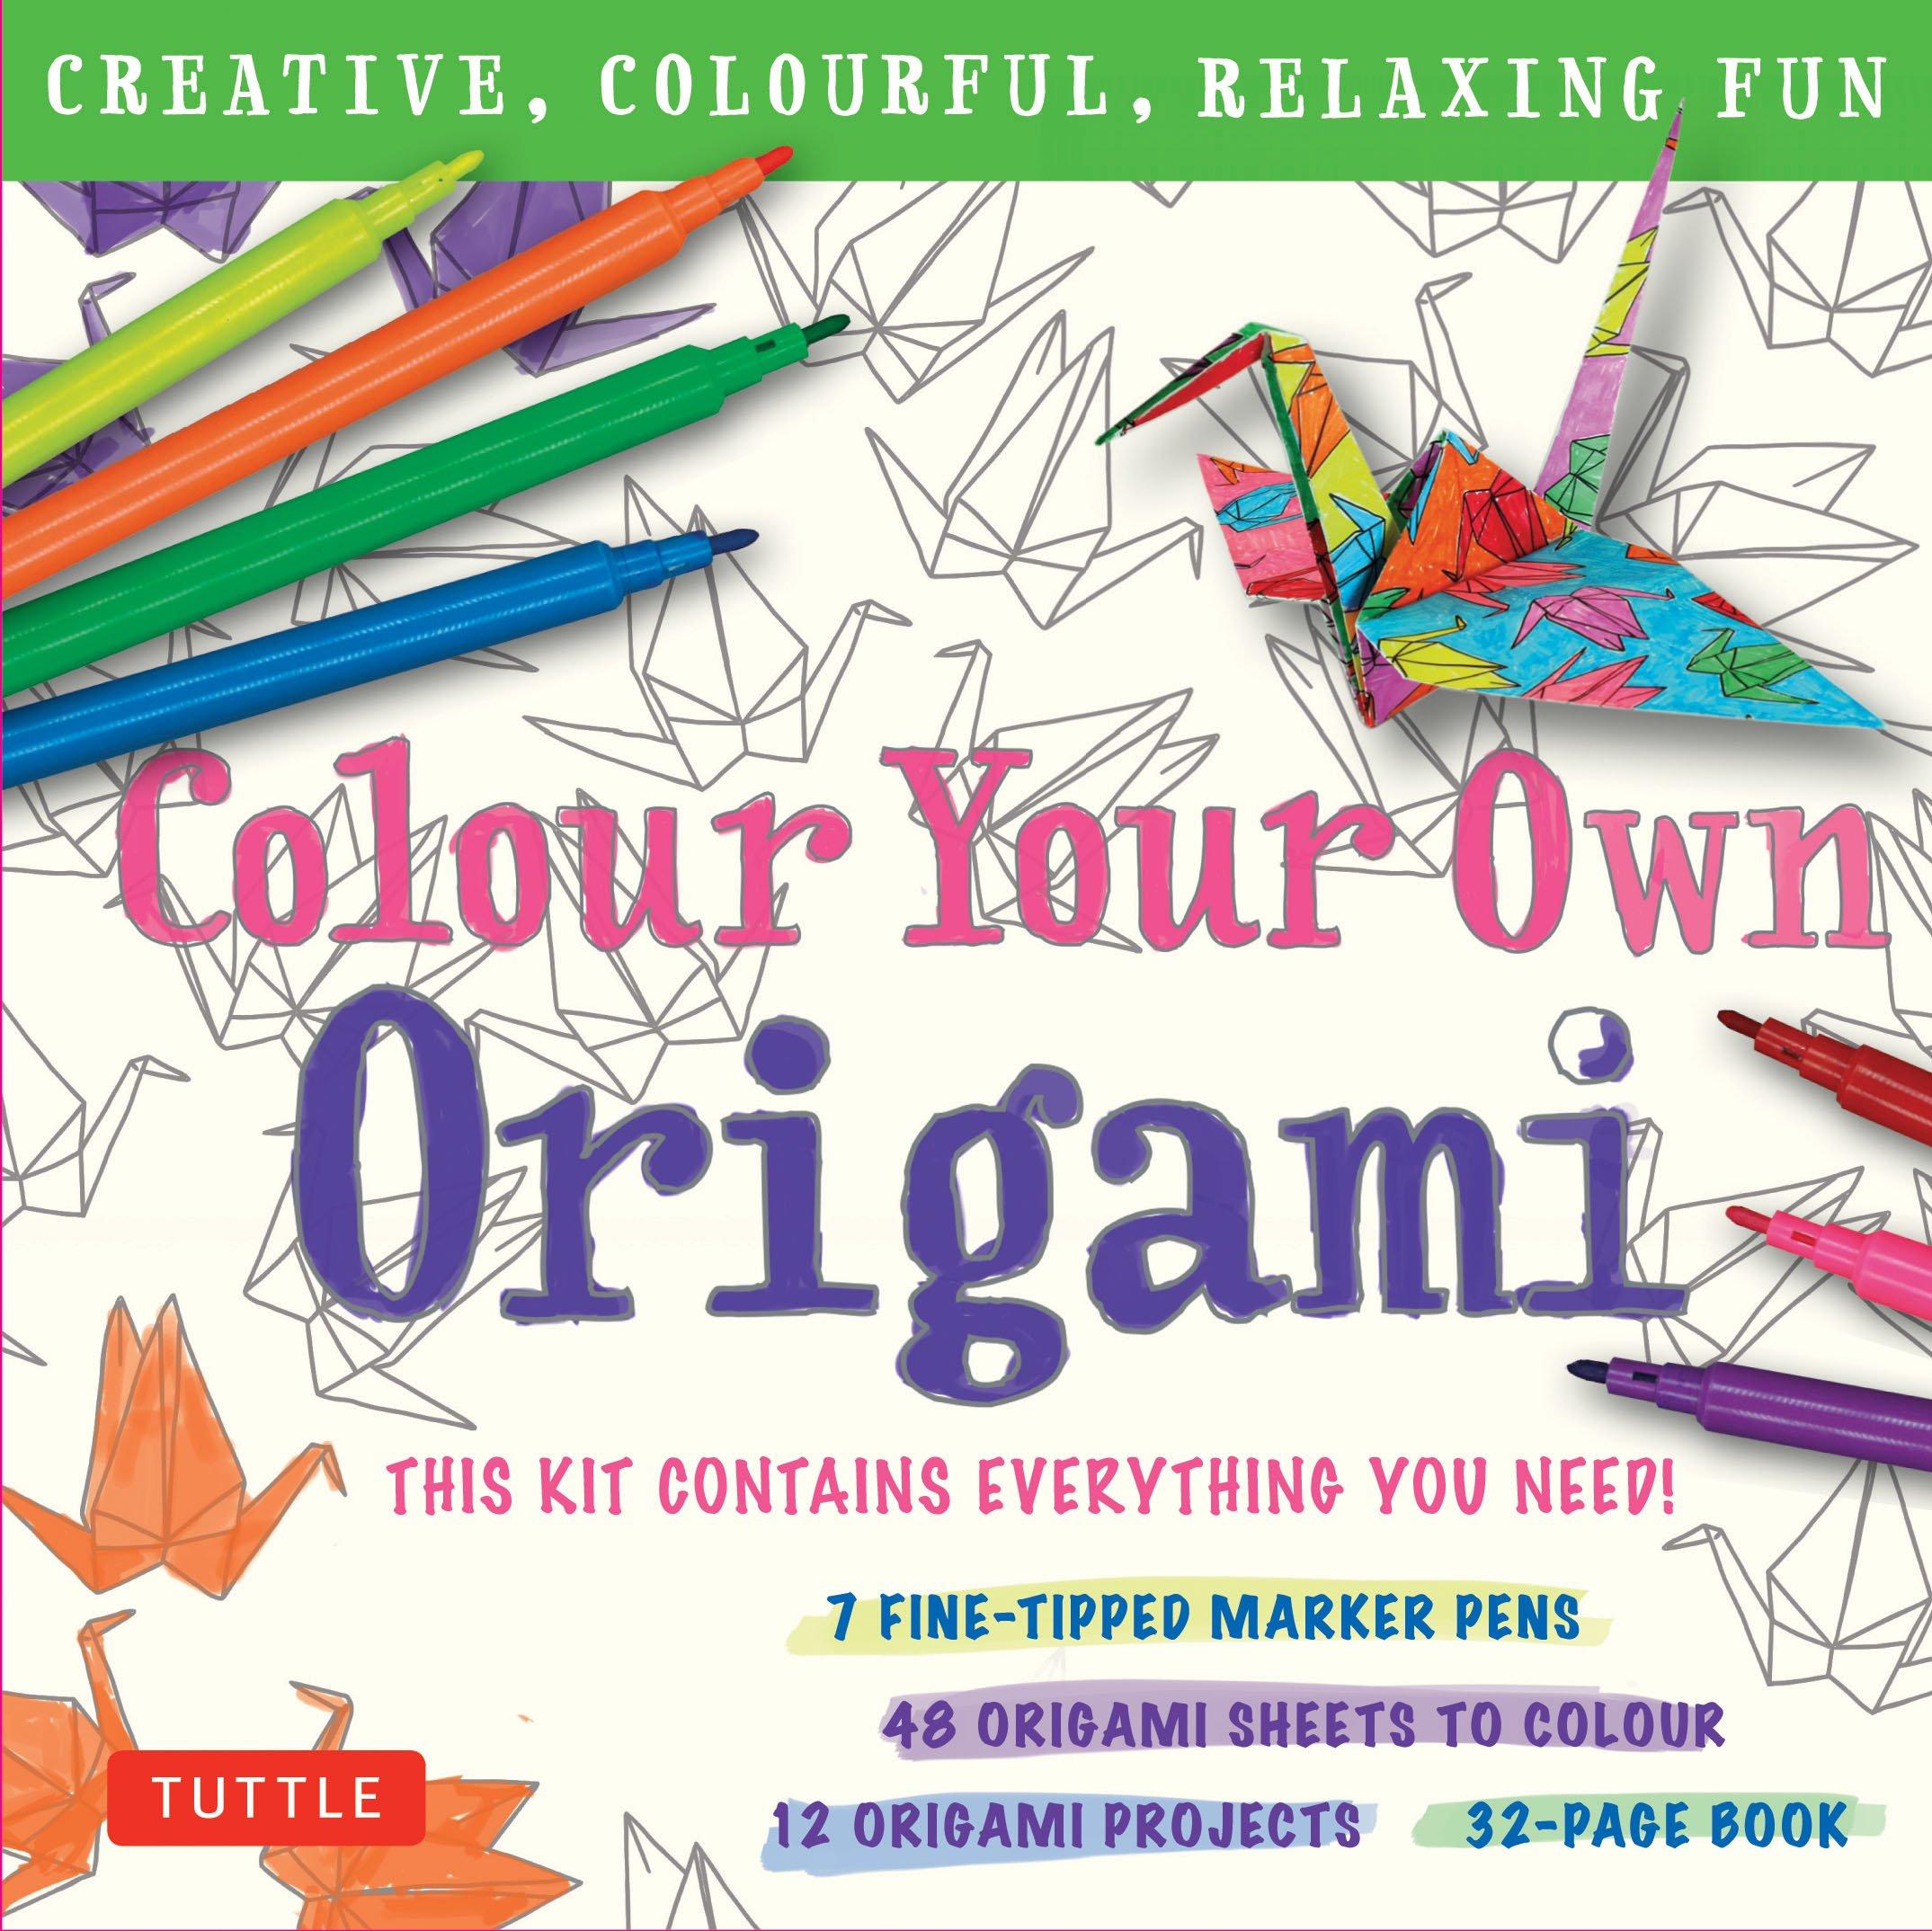 Amazon.com: Colour Your Own Origami Kit (British Spelling ...